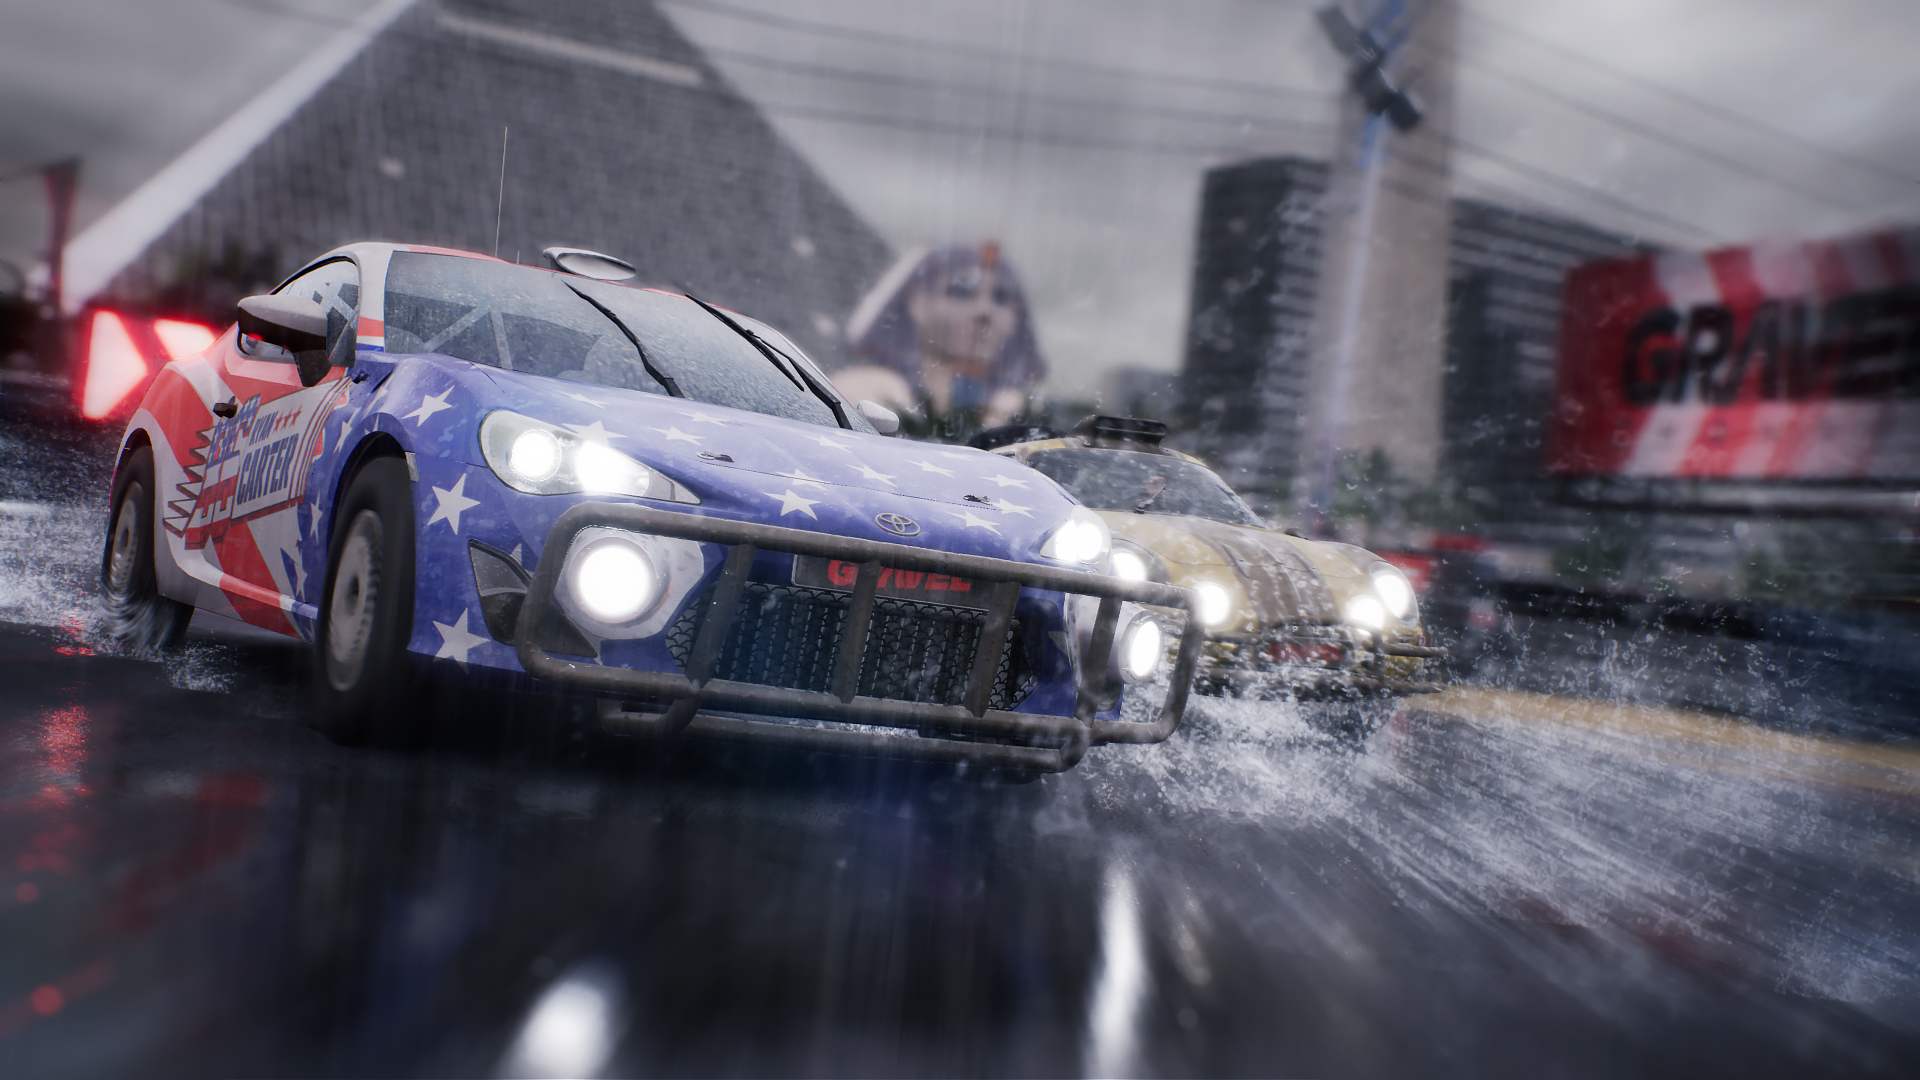 Demo confirmed for arcade racer Gravel